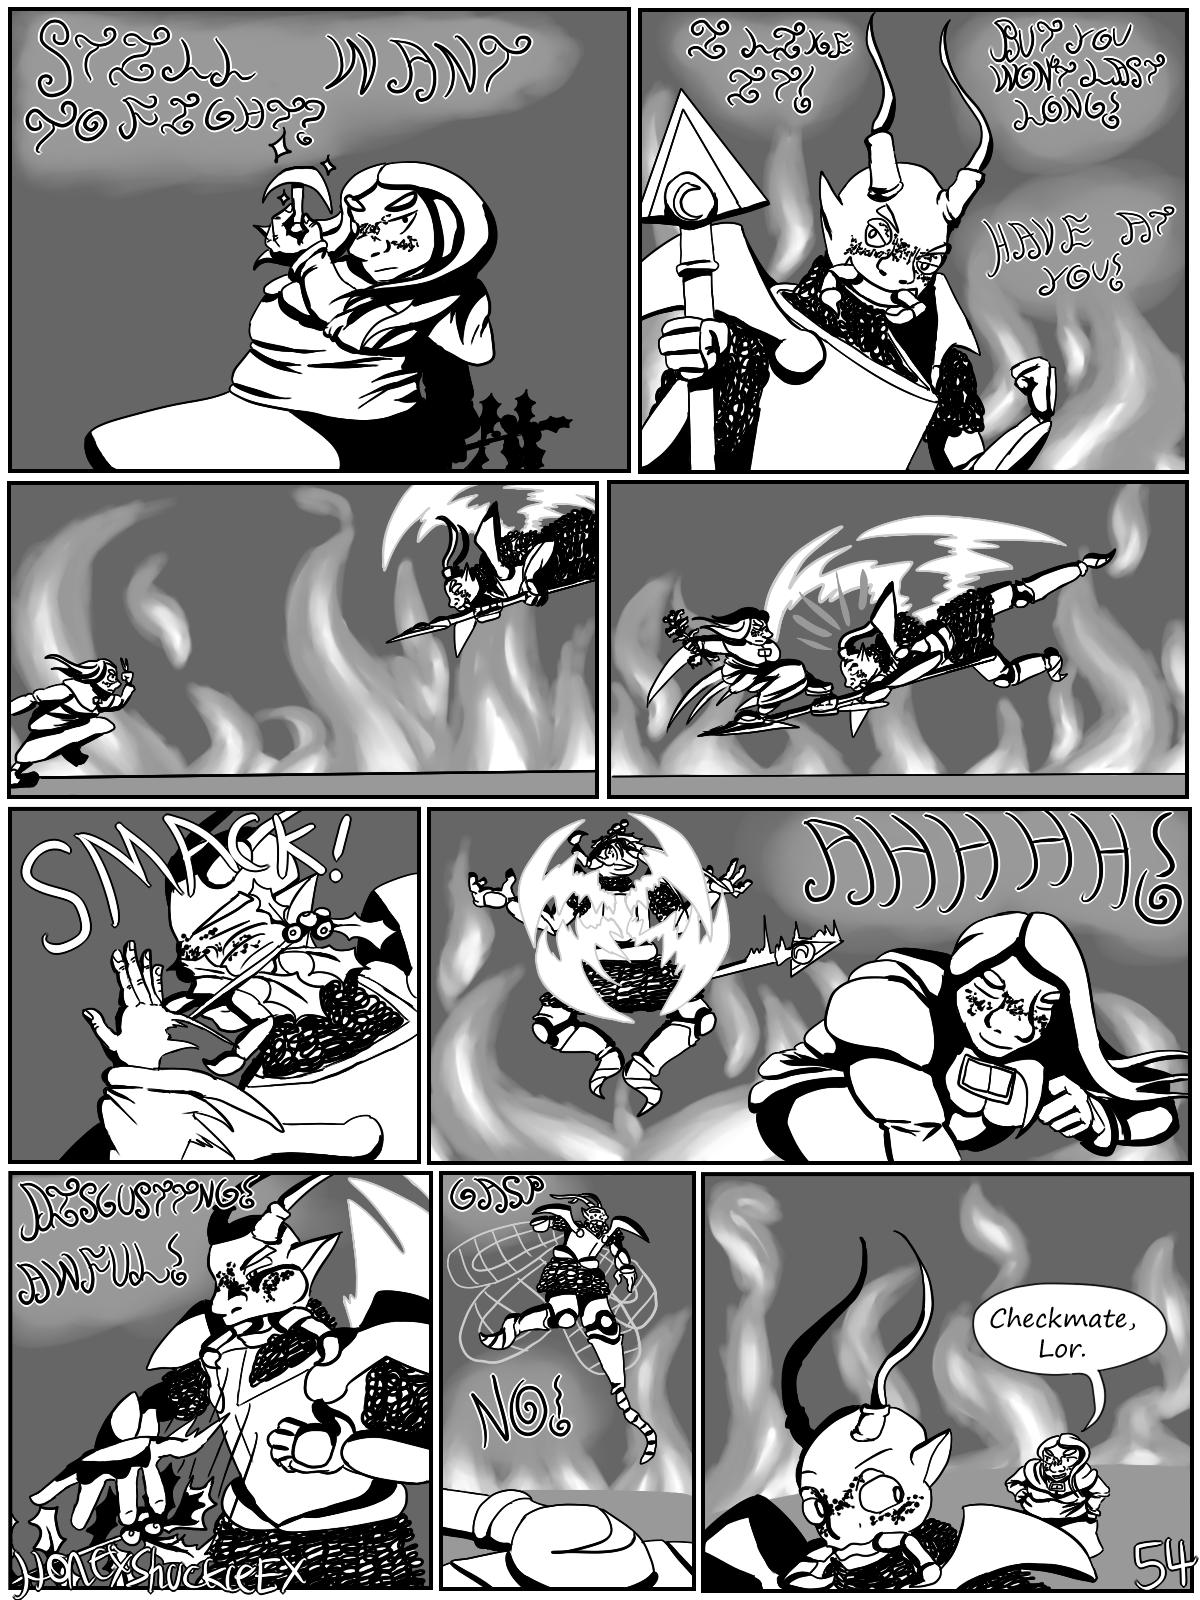 Pixie Dust page 54